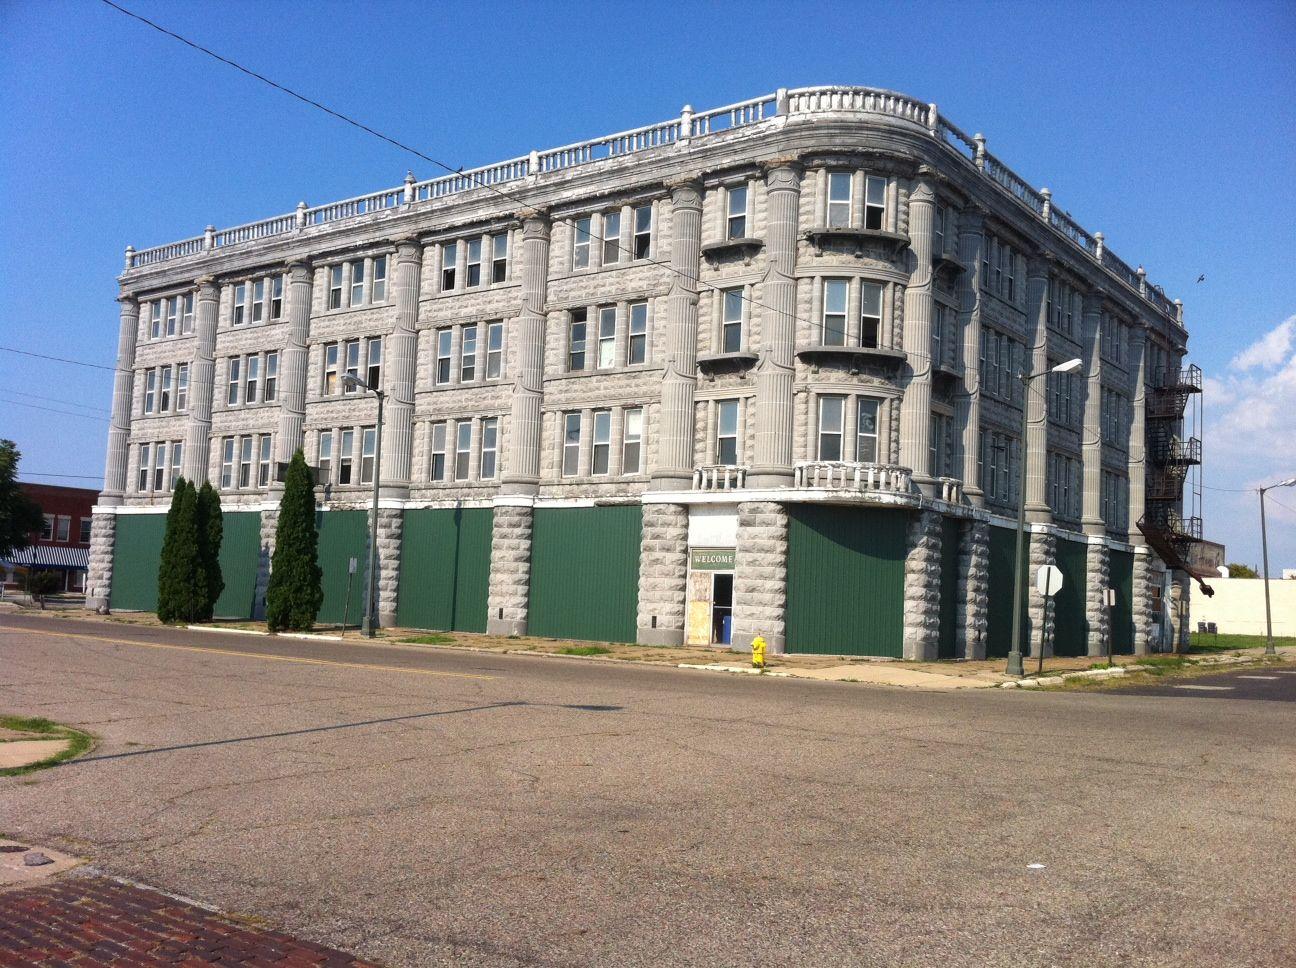 City Of David Benton Harbor Michigan S Hotel Now Empty Downtown